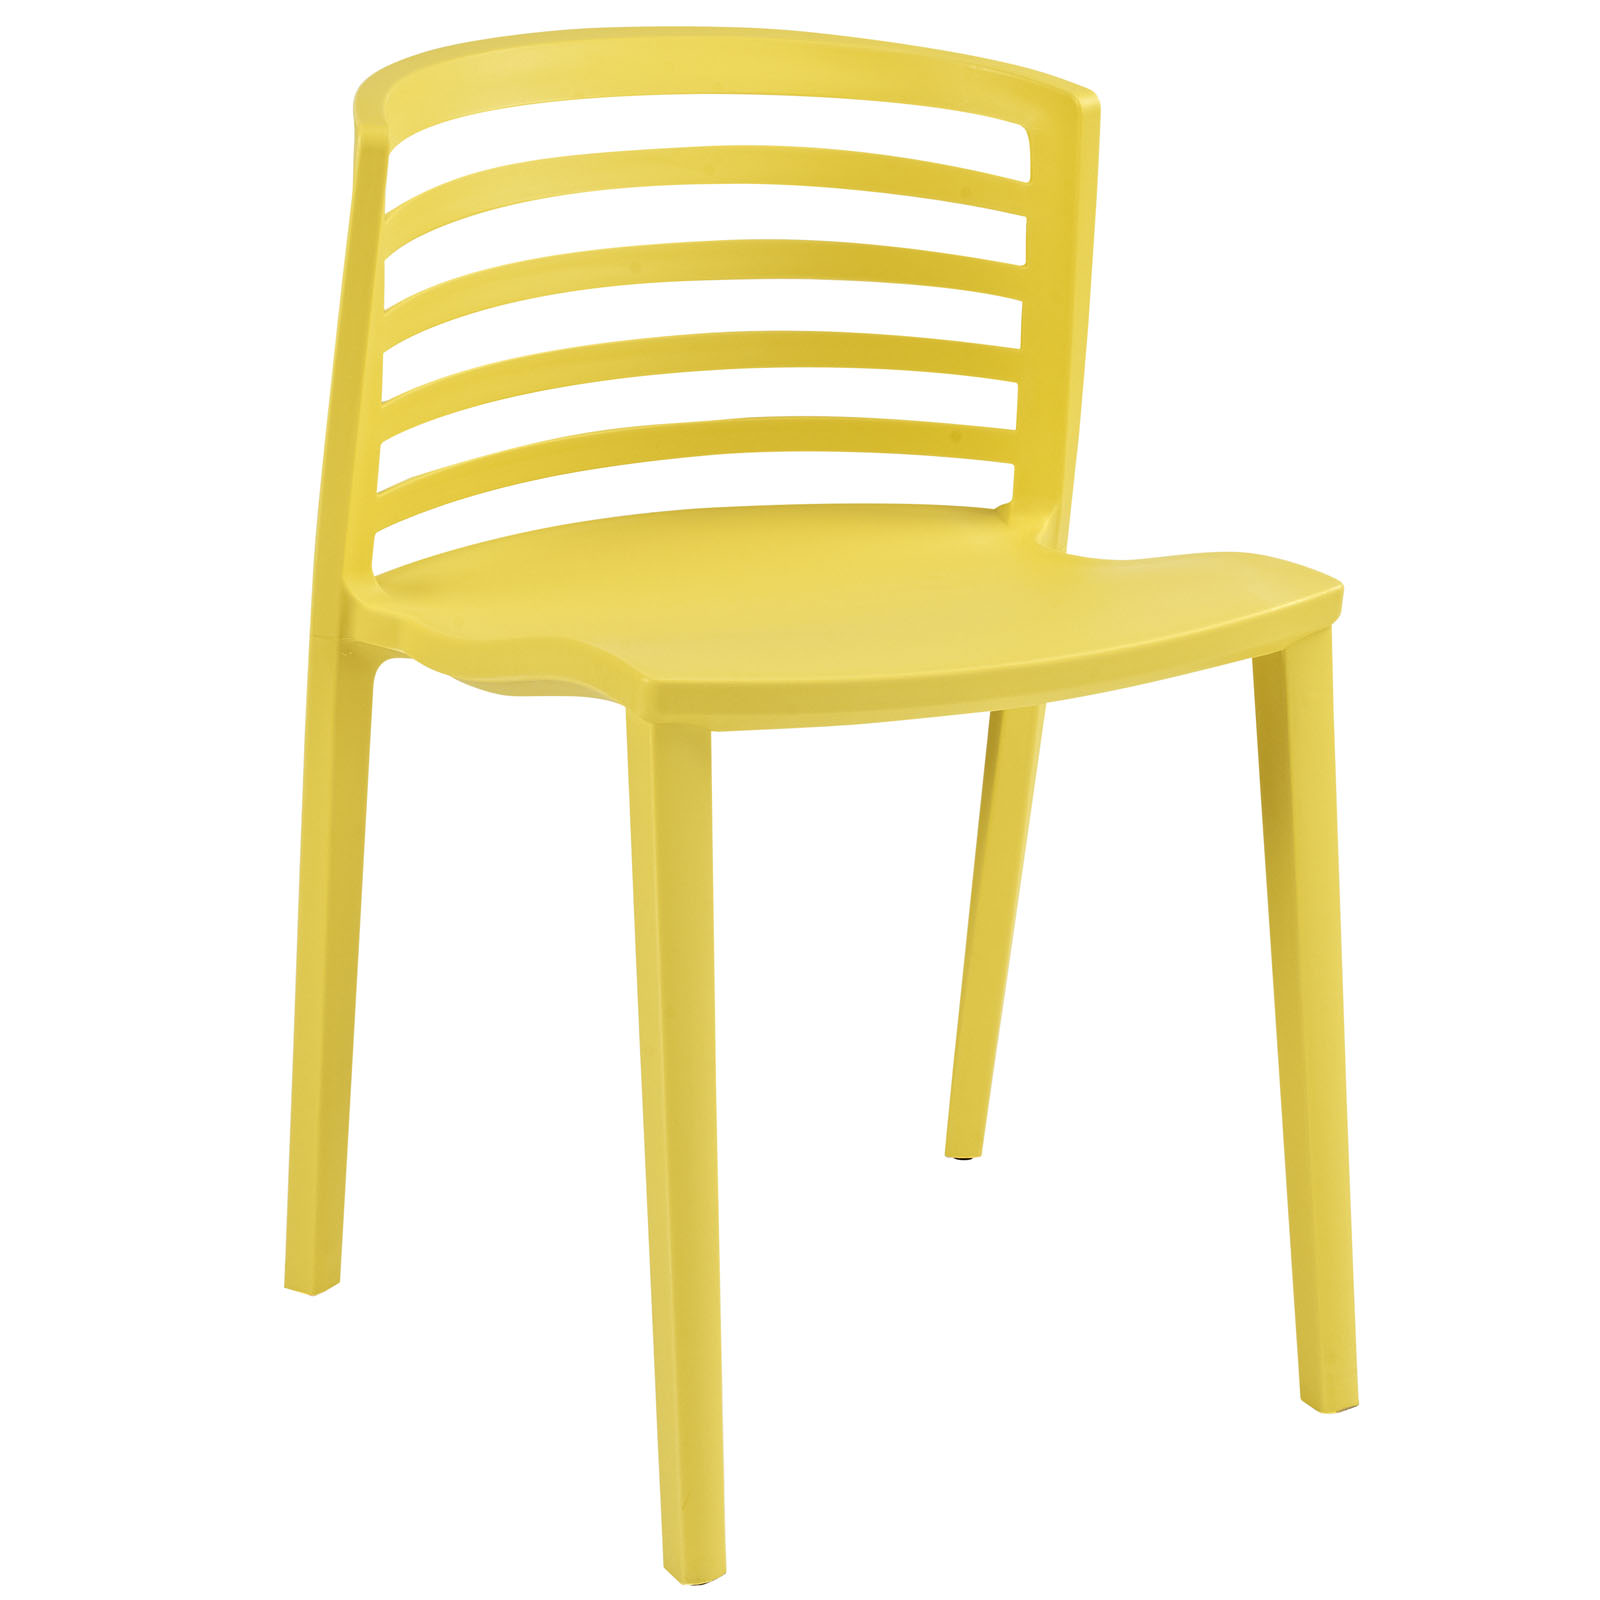 Tremendous Curvy Side Chair Dailytribune Chair Design For Home Dailytribuneorg